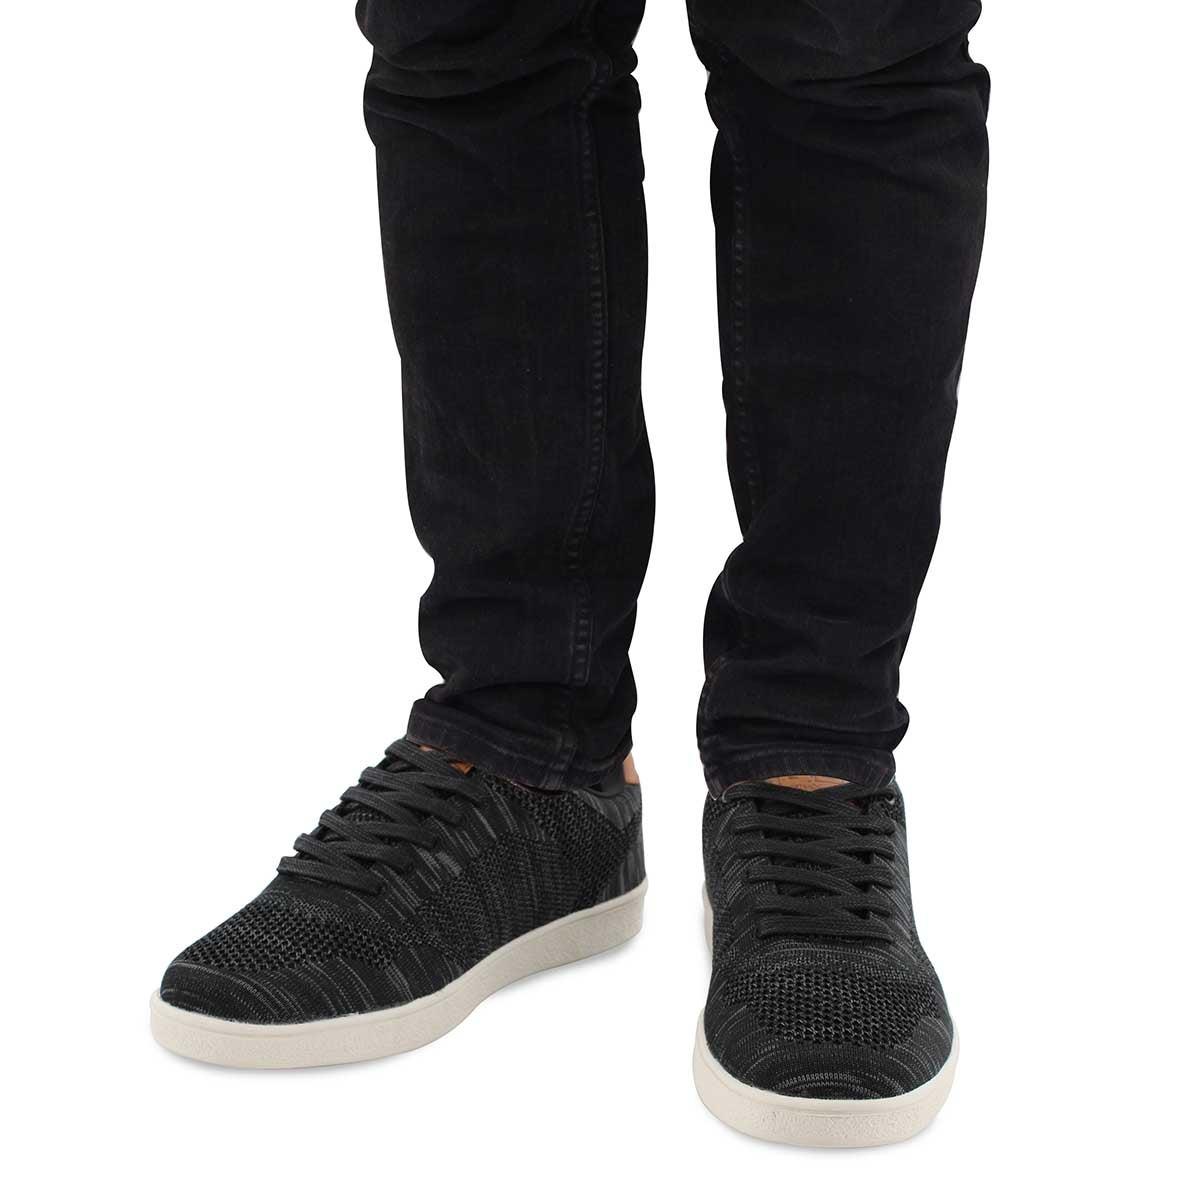 Mns Brandon black casual sneaker